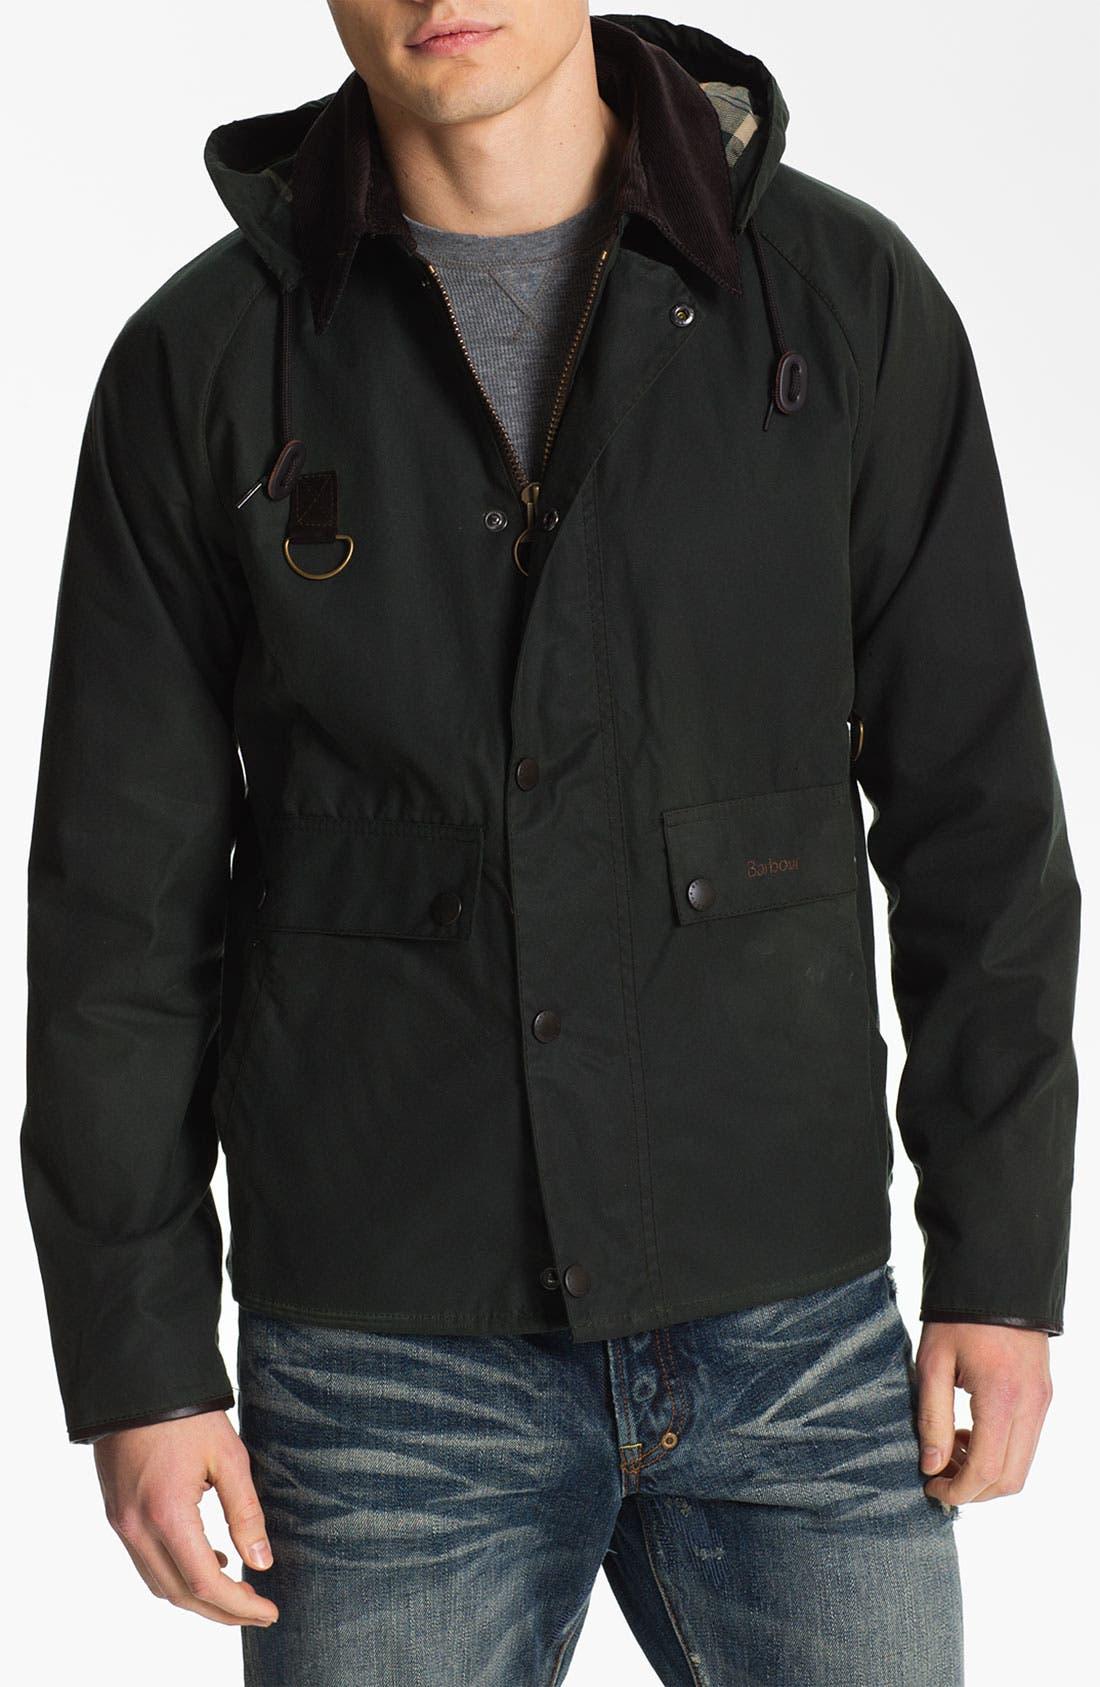 Main Image - Barbour 'Standen' Hooded Jacket